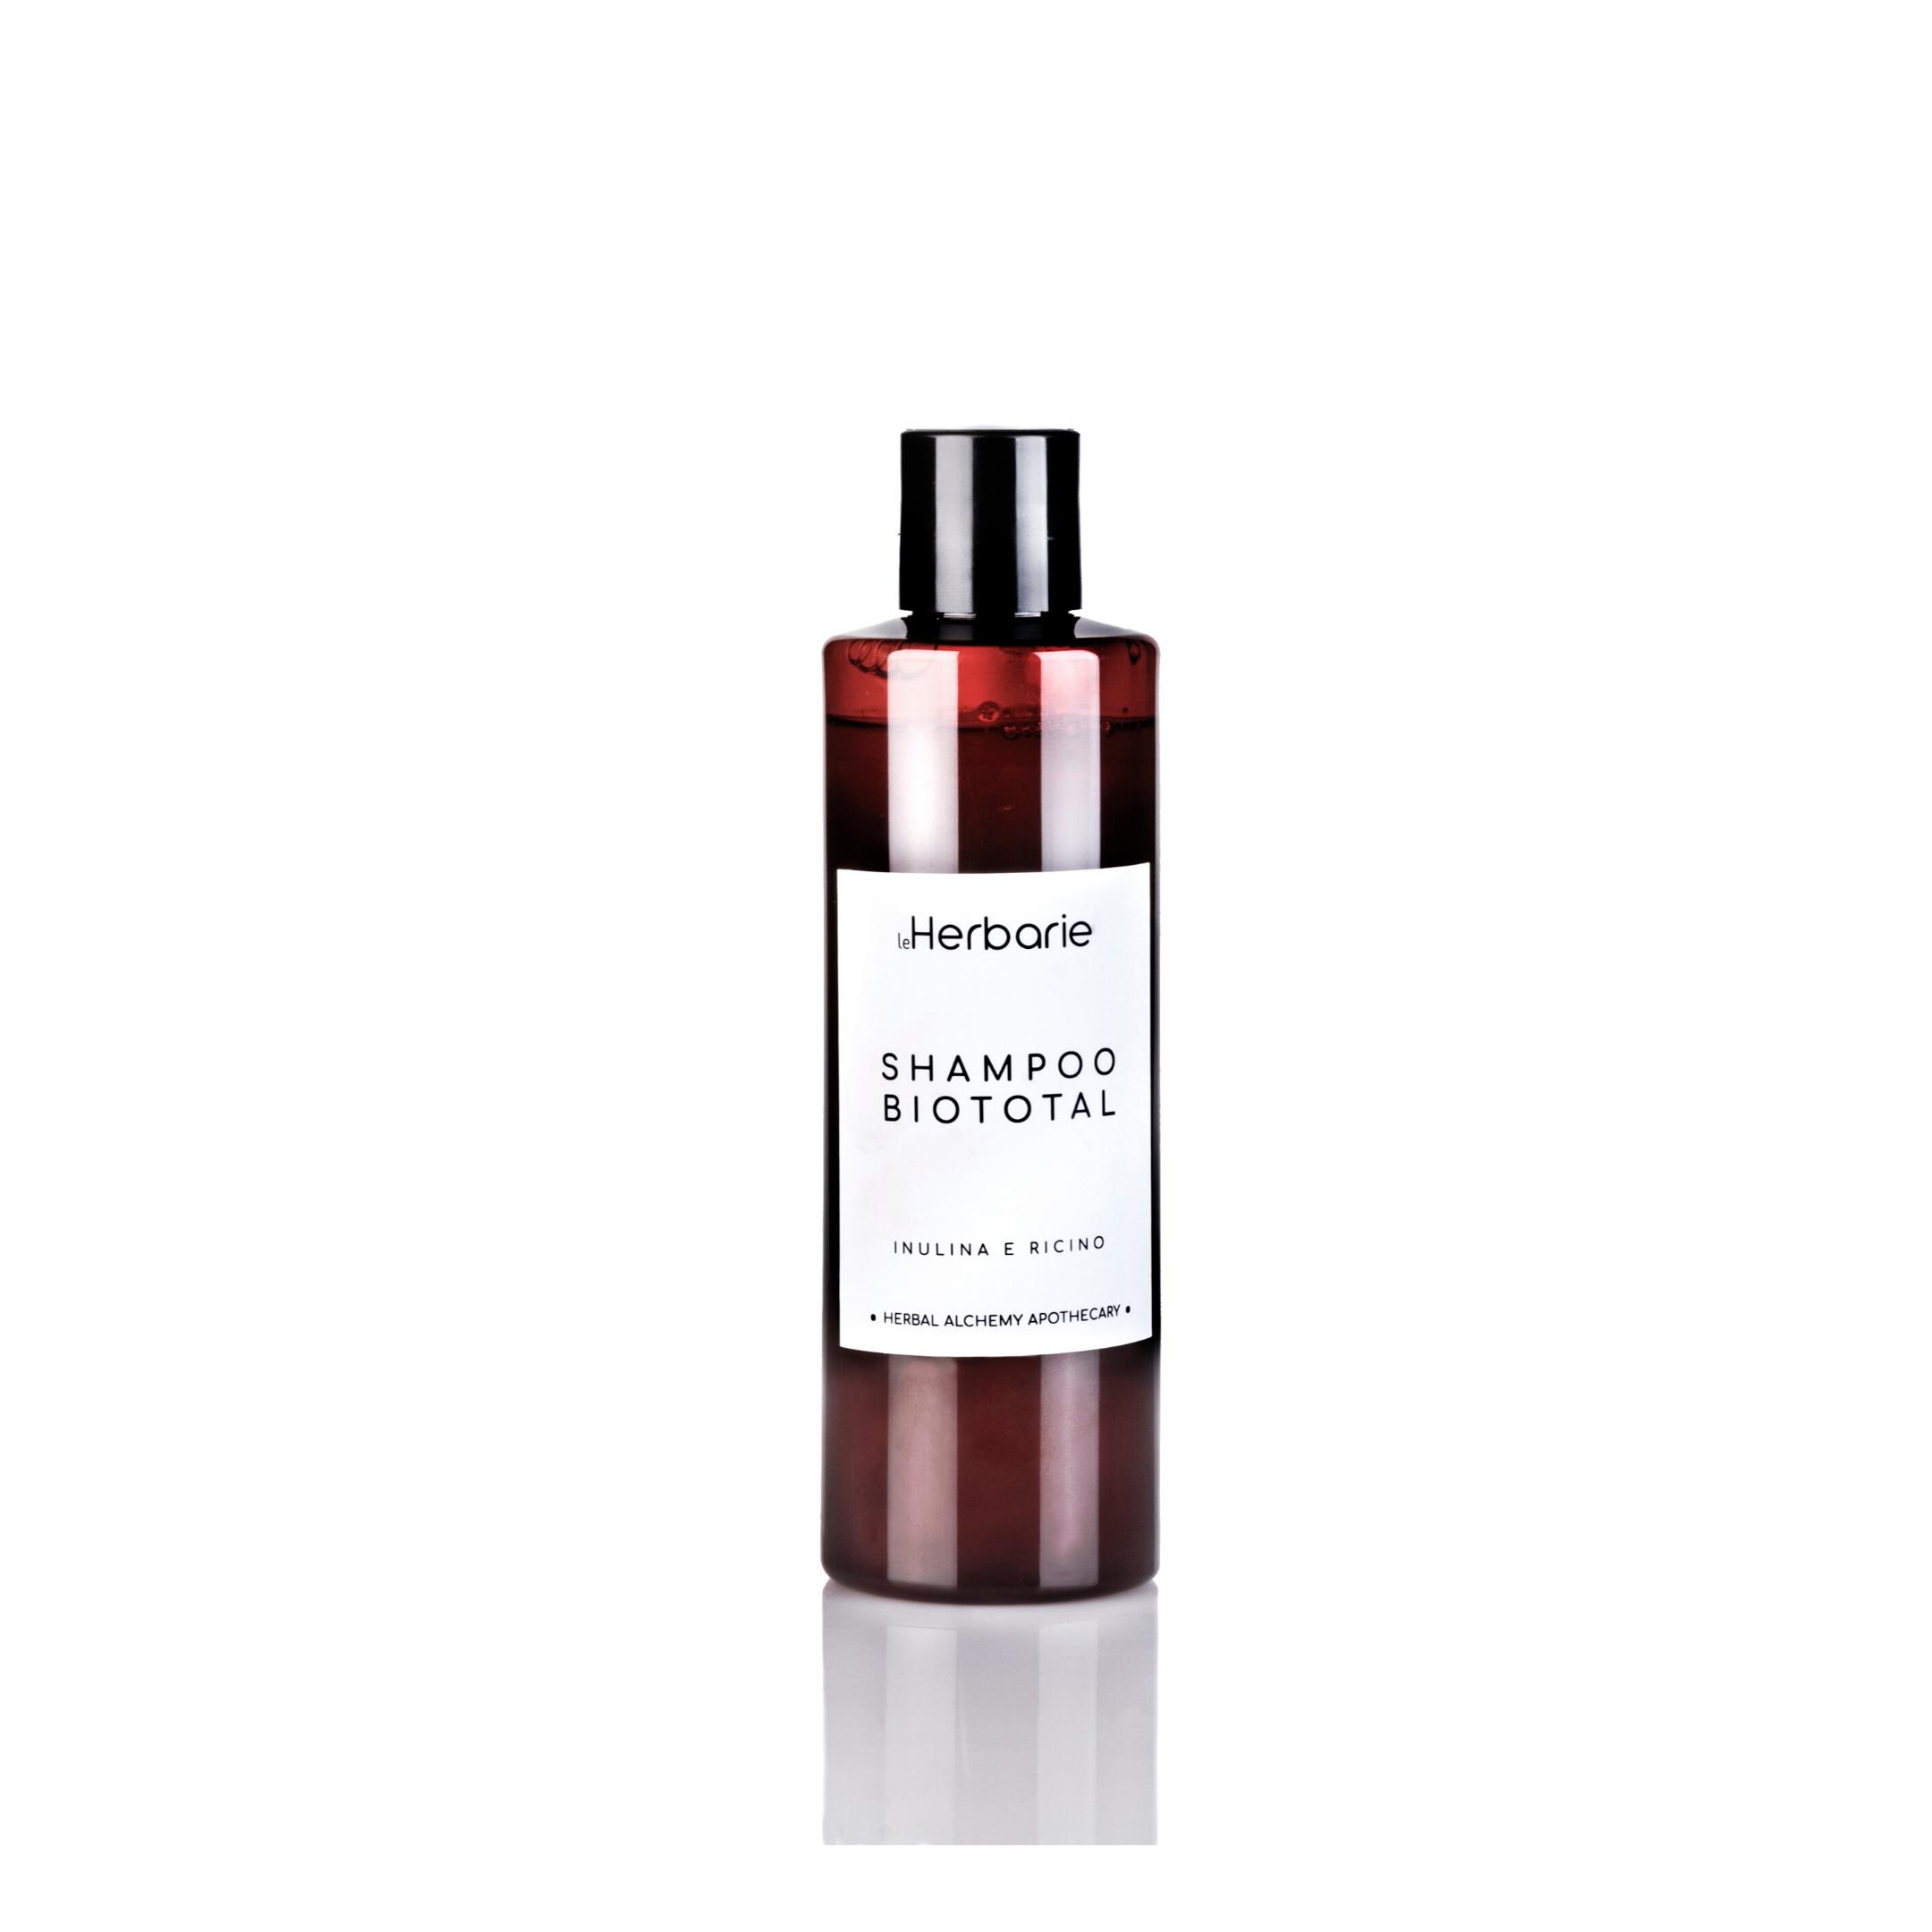 Shampoo biototal